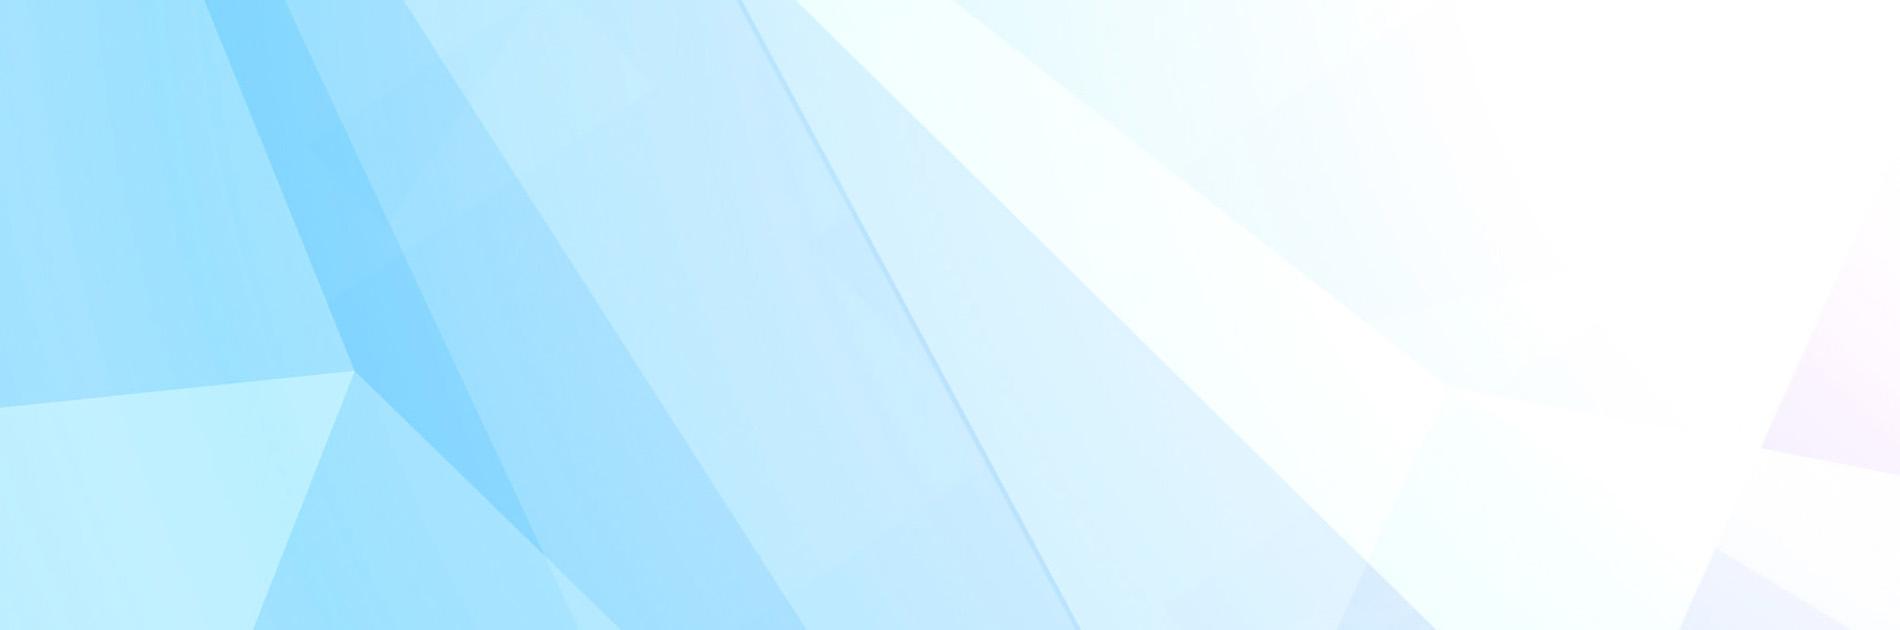 Modele-diapo-fond-bleu-avec-forme-1900px